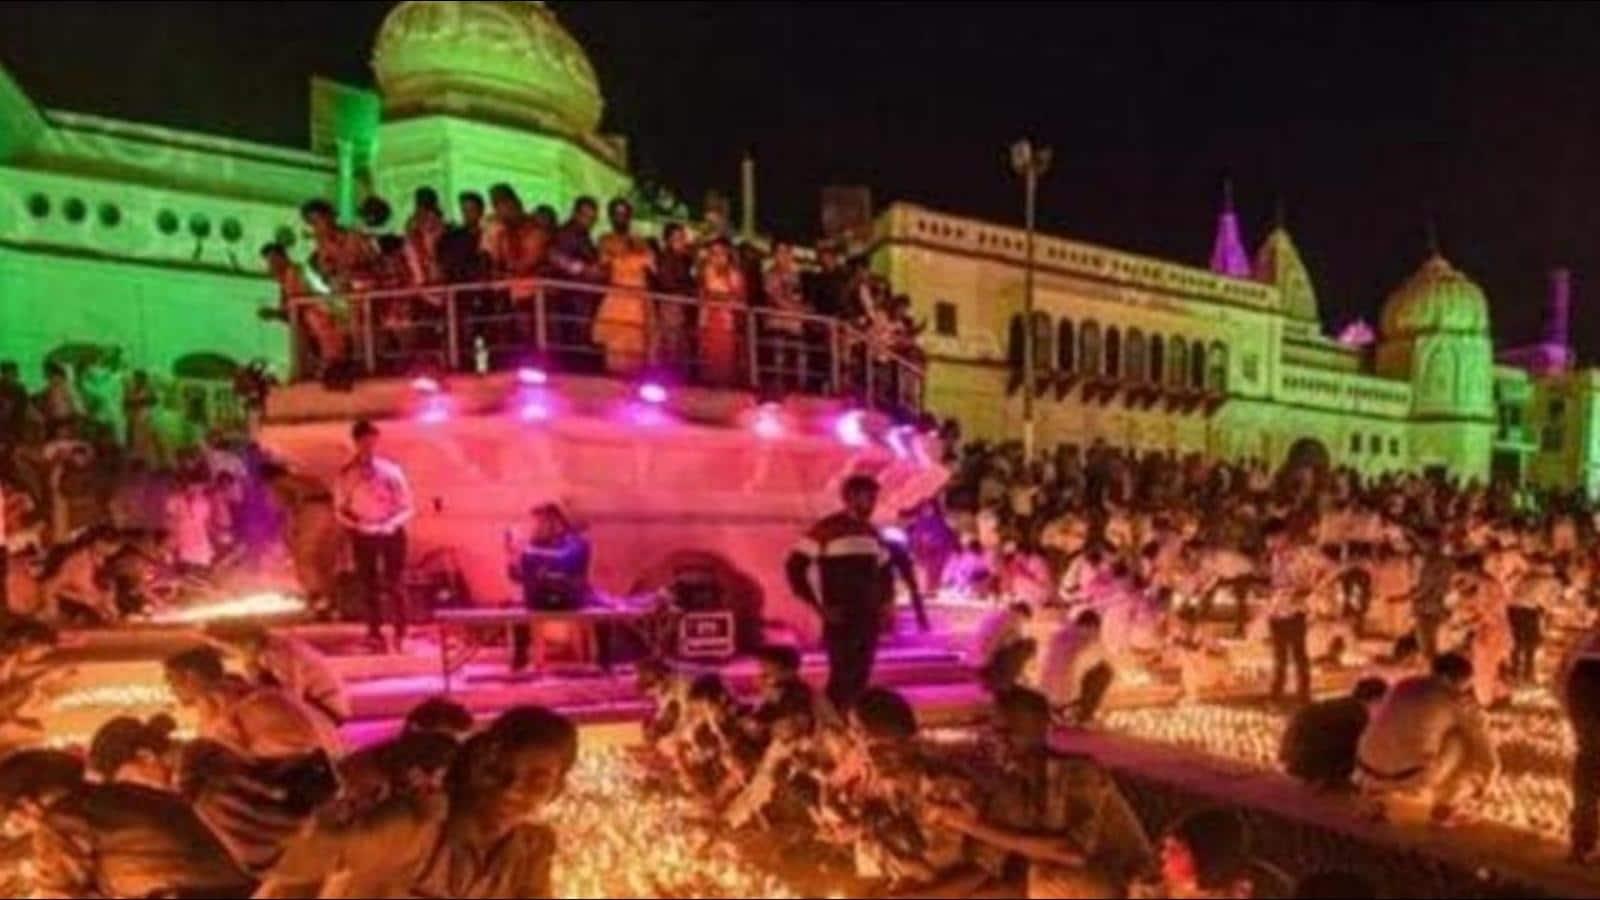 Grand Deepotsav celebrations in Ayodhya from November 1 to 6